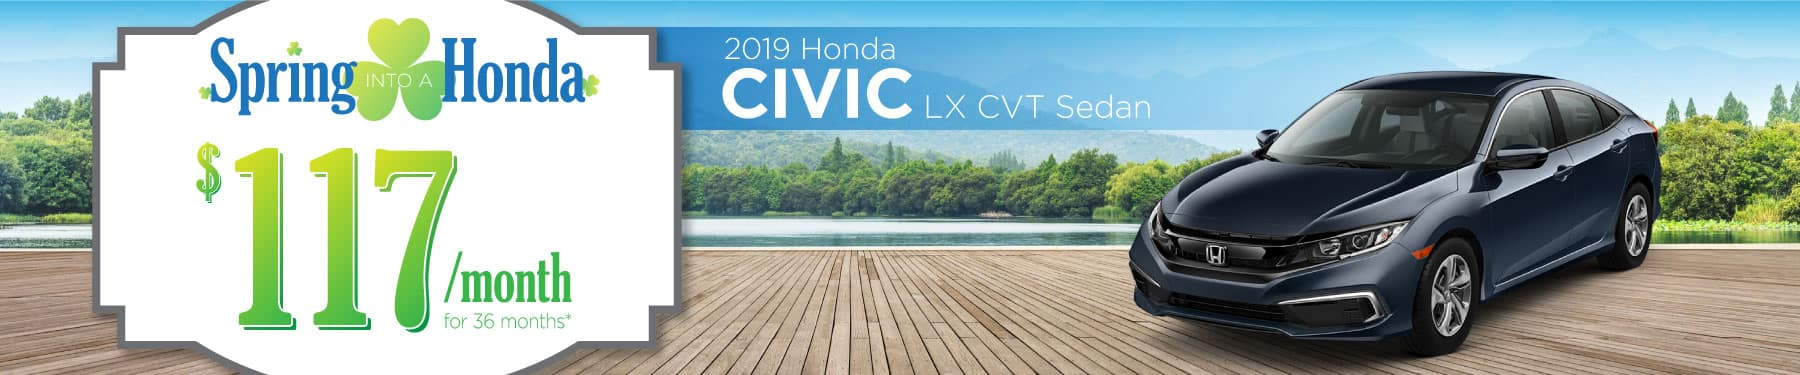 Header Photo of the 2019 Honda Civic